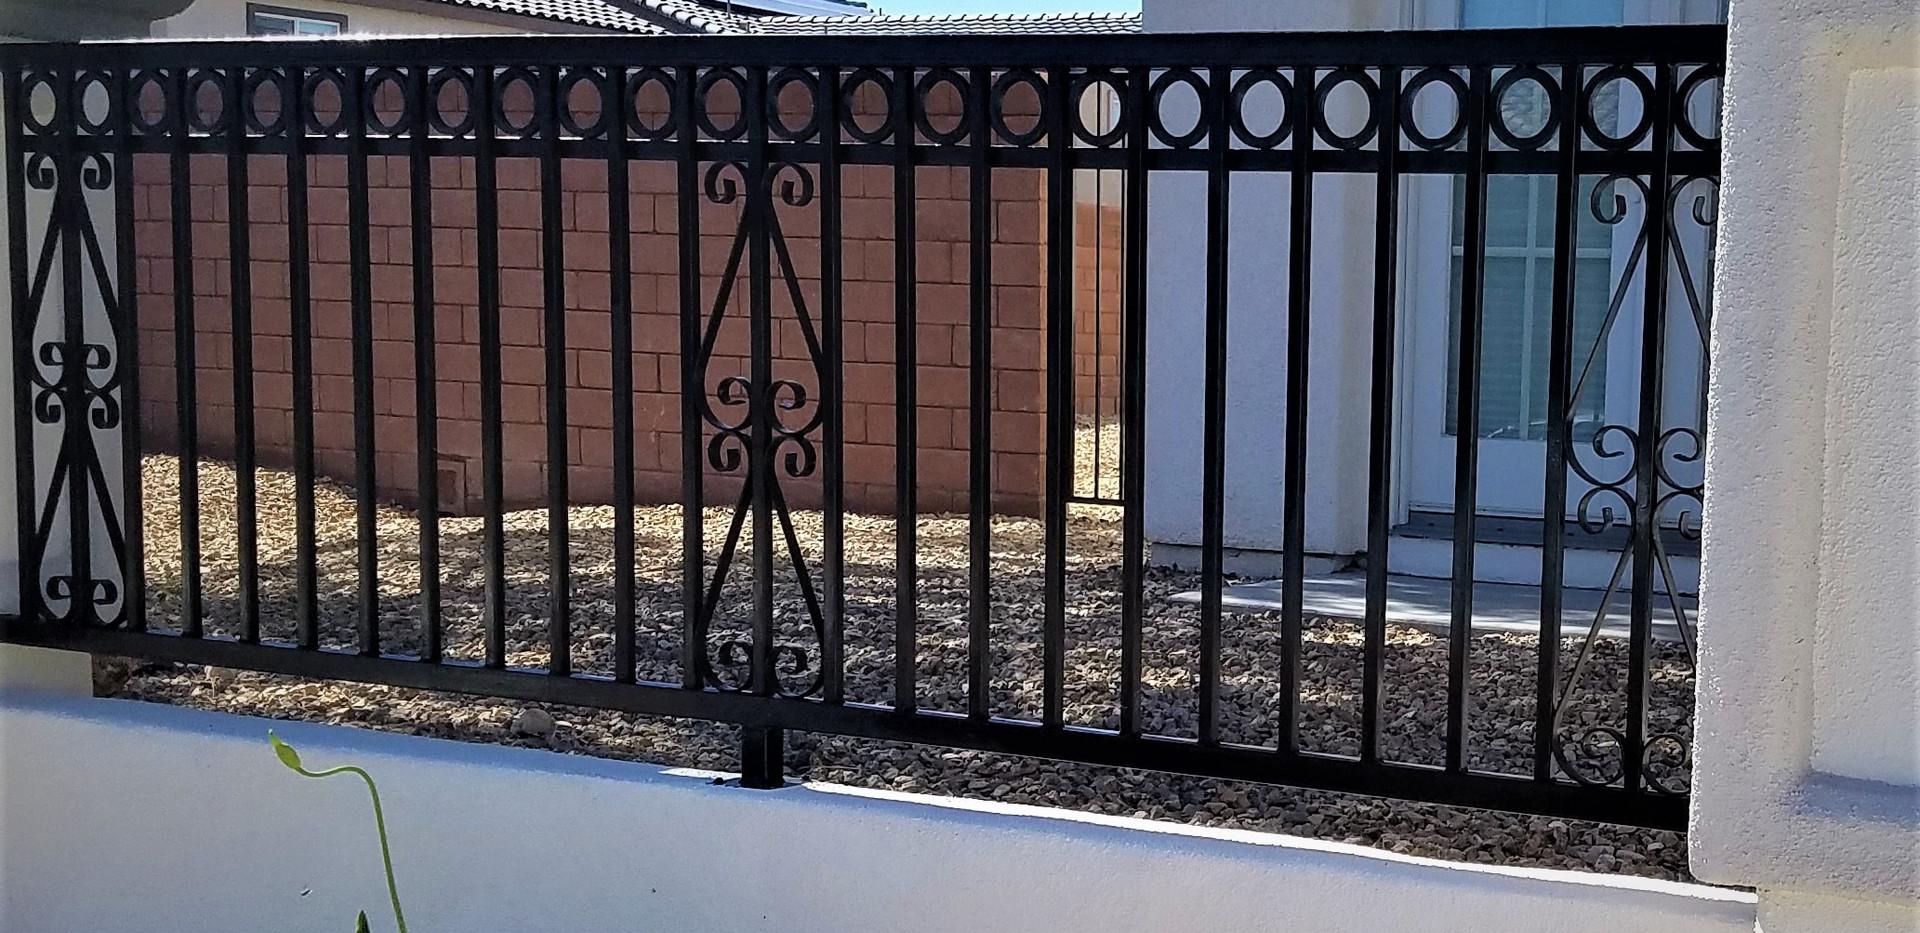 Residential - The Tiberti Fence Company - Las Vegas, Nevada